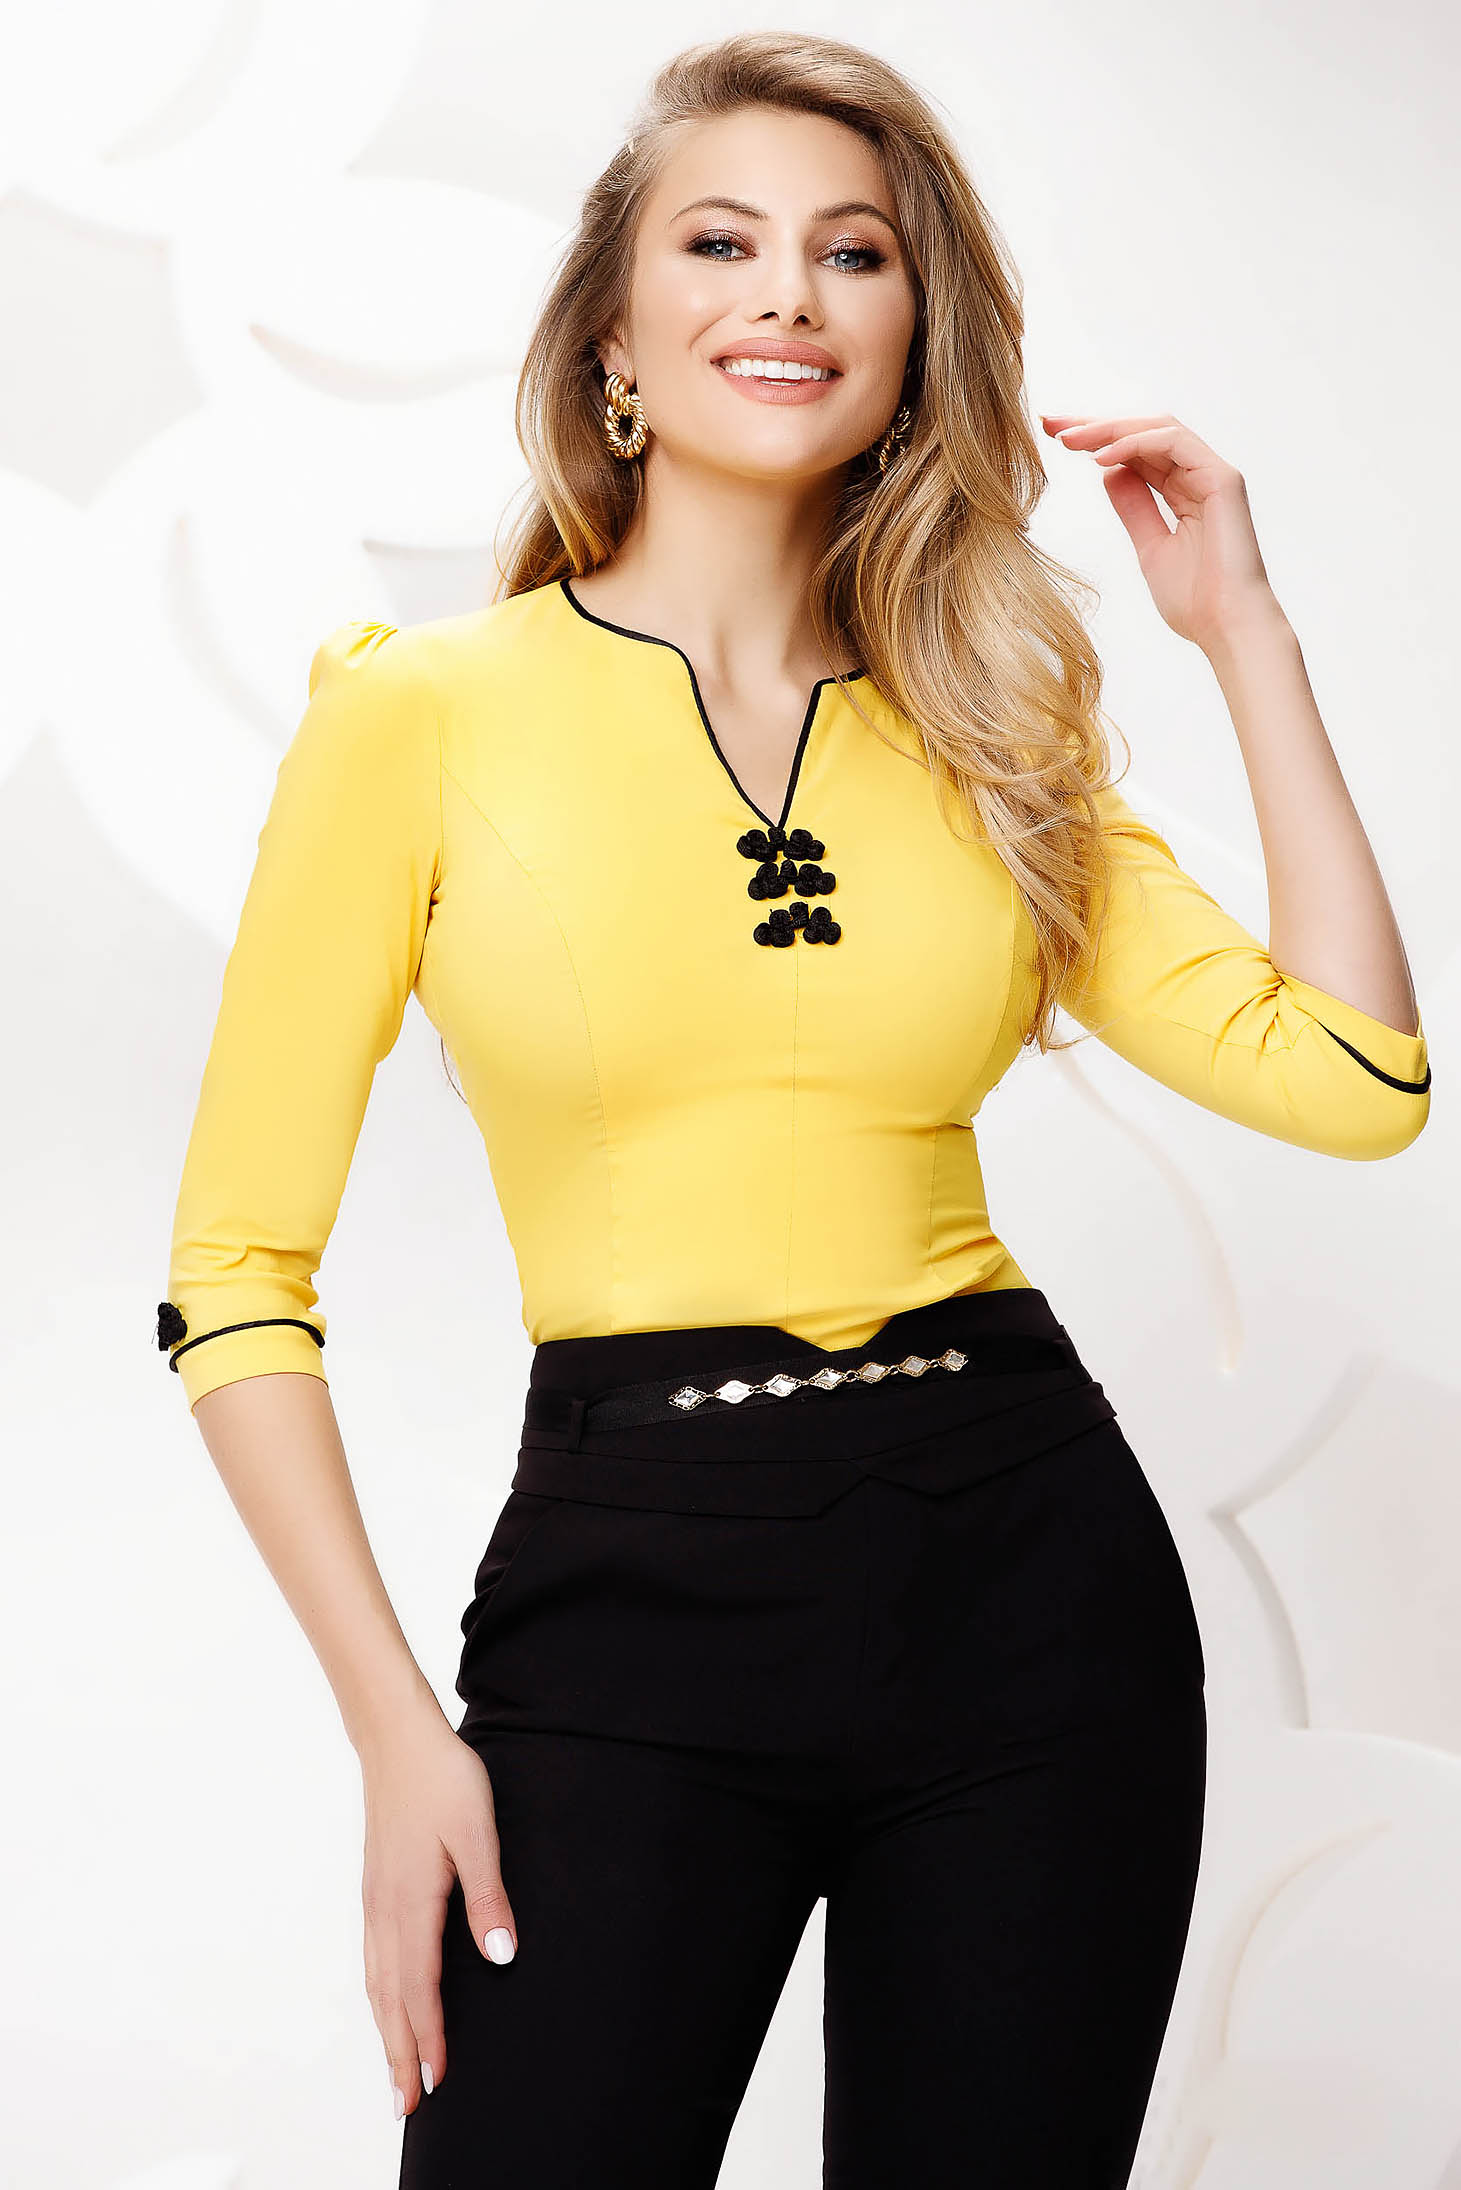 Sárga Fofy irodai női ing rugalmas pamut hímzett betétekkel